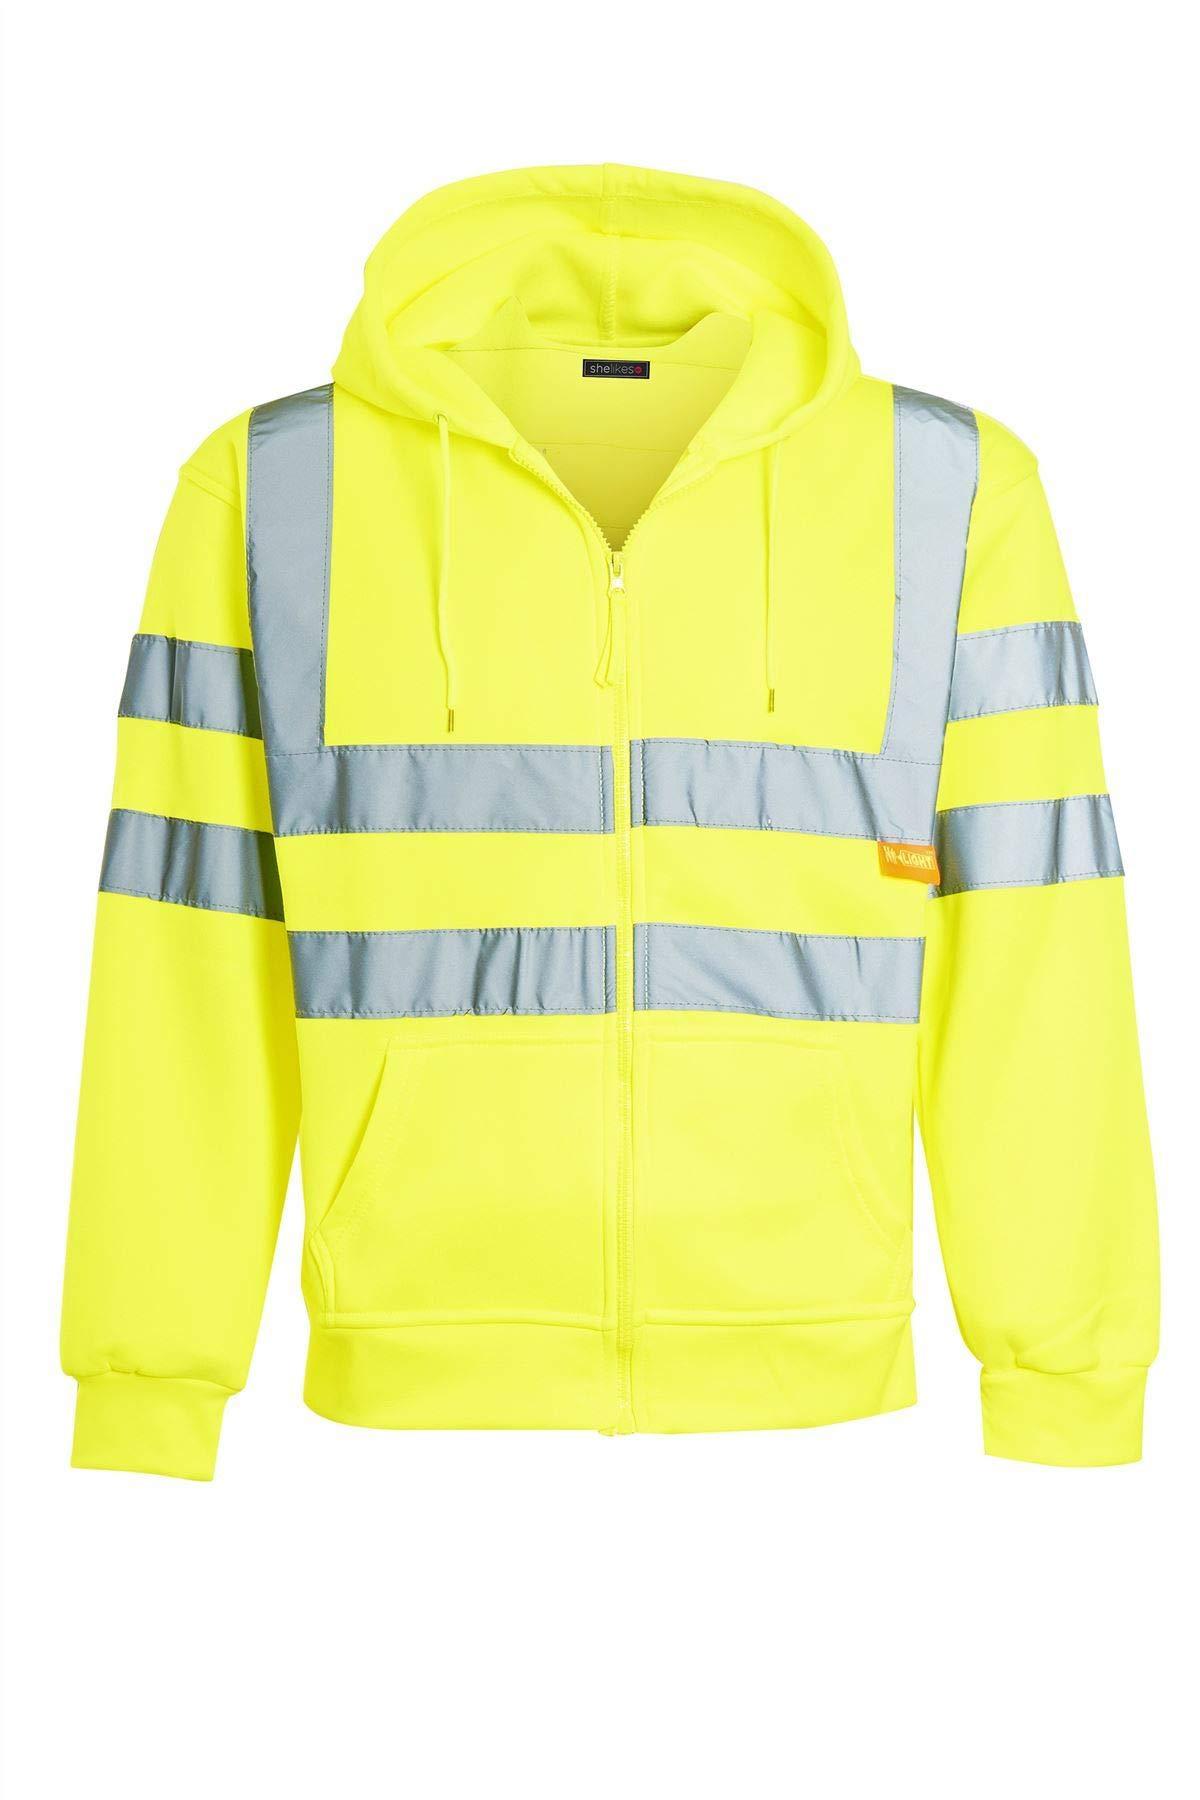 Shelikes Mens Zip up Fleece Hoody Hooded Hi Viz Visibility Sweatshirt Safety Security Work Jumper Top [Yellow XLarge]